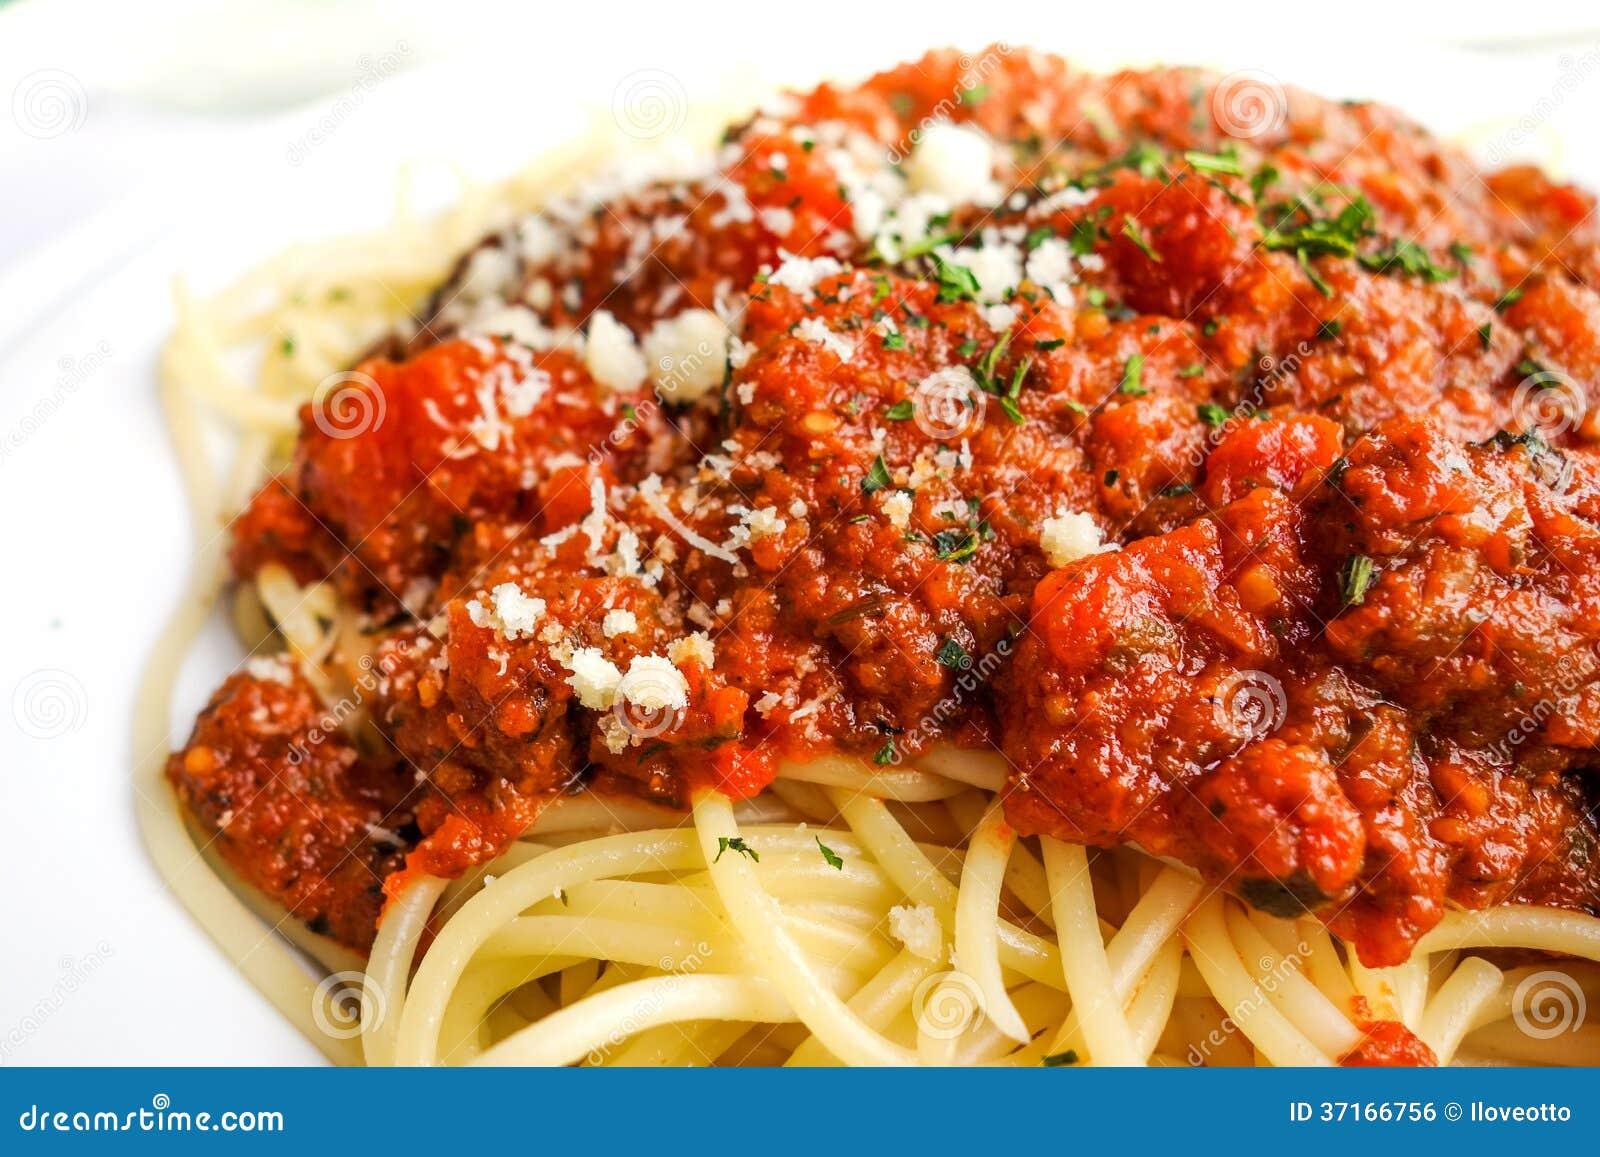 Tasty Pasta-Italian Meat Sauce Pasta Royalty Free Stock Image - Image ...